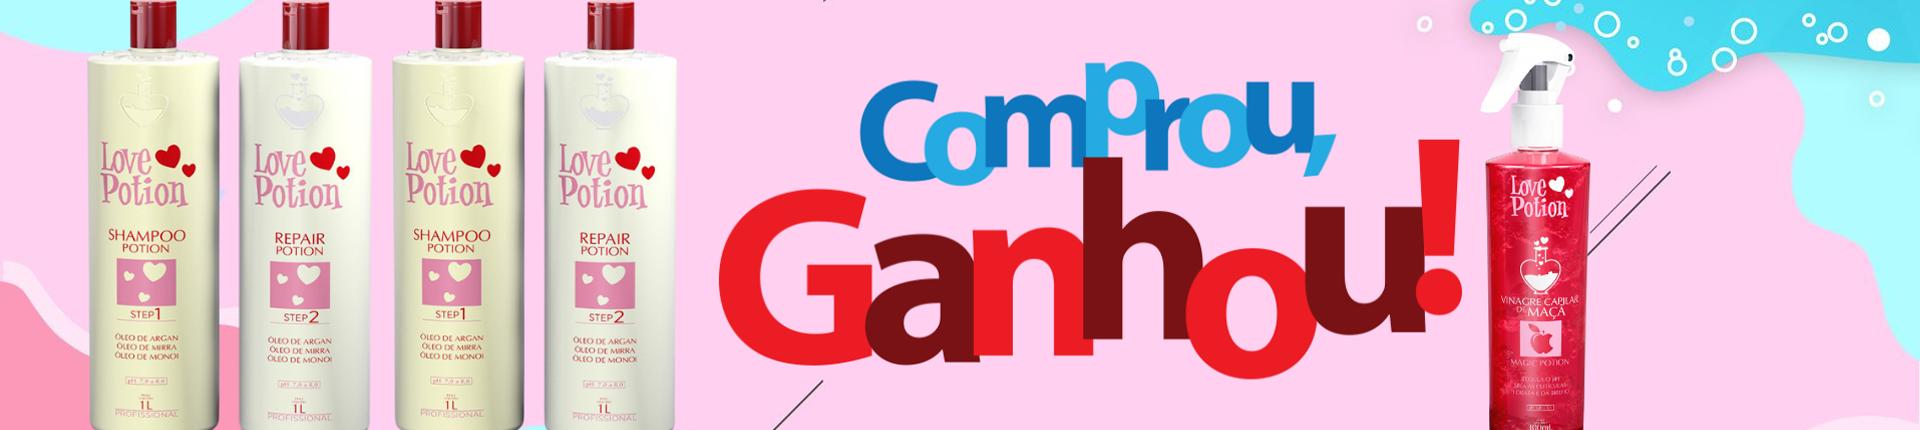 COMPROU GANHOU - REPAIR = VINAGRE